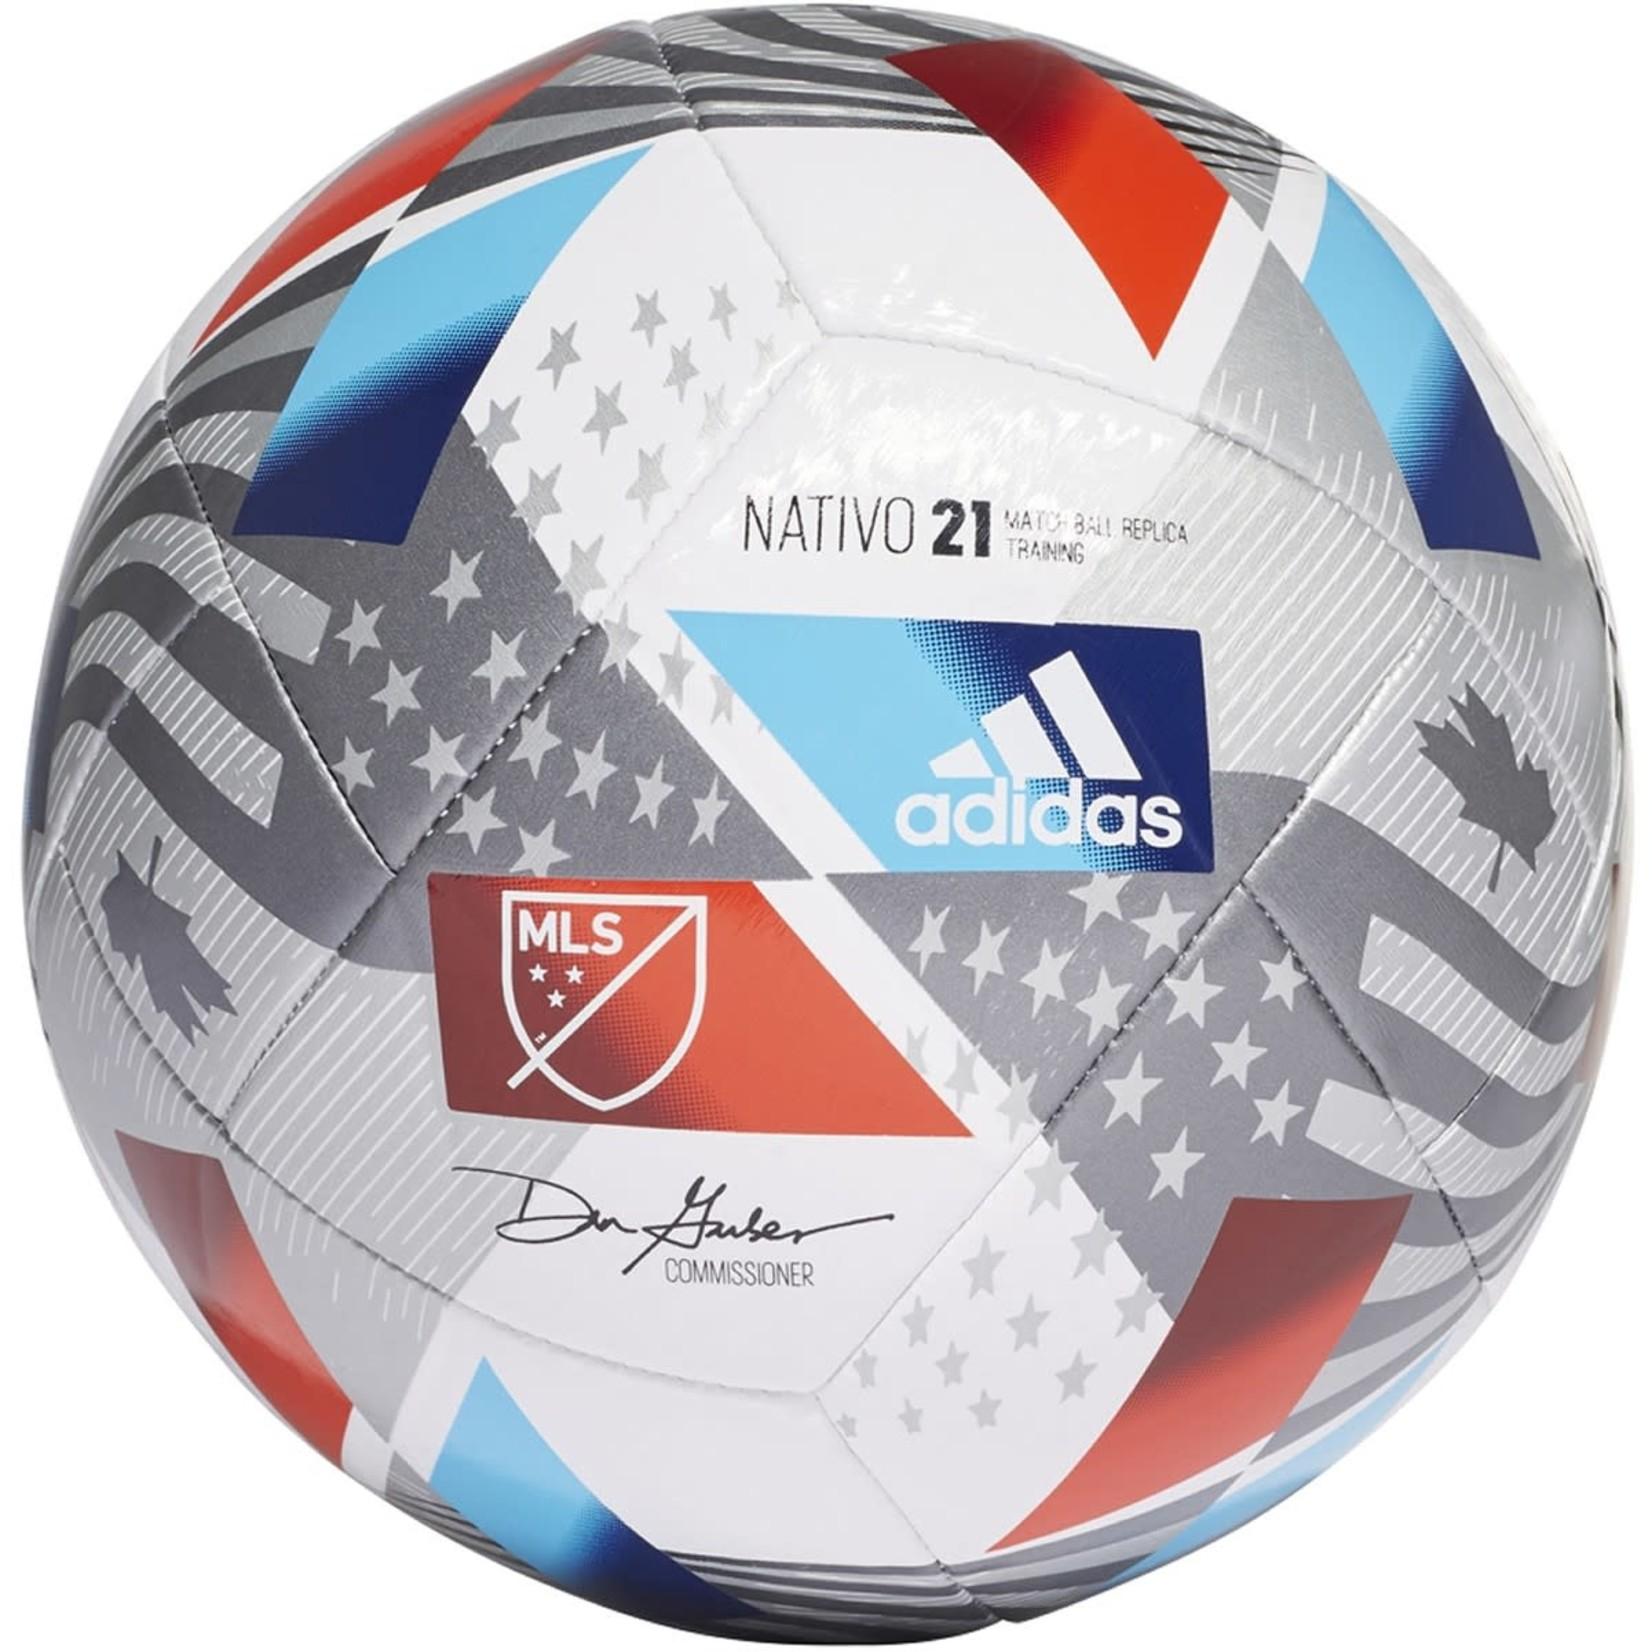 ADIDAS MLS NATIVO 21 TRAINING BALL (WHITE/BLUE/RED)